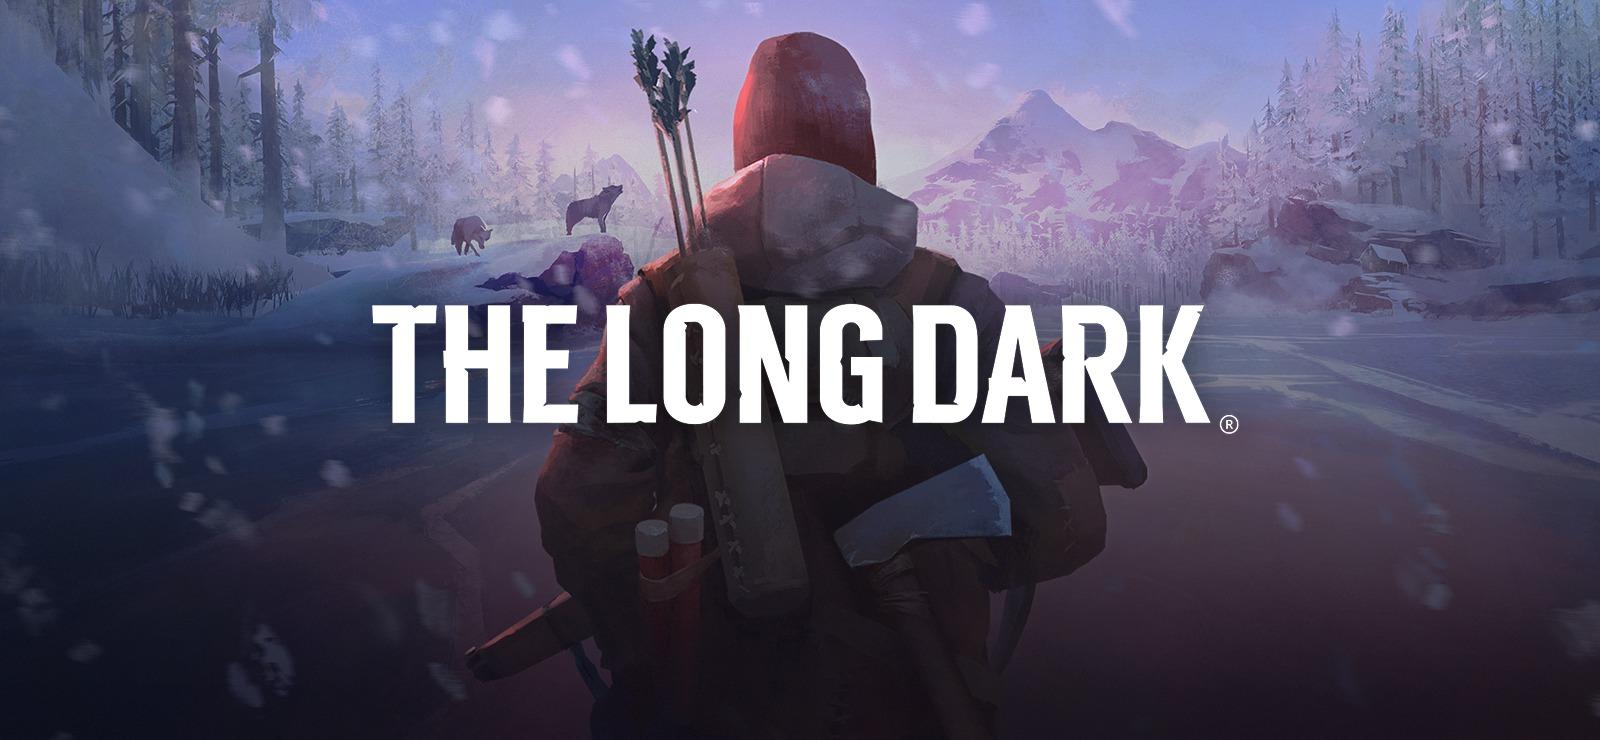 the long dark steam free download